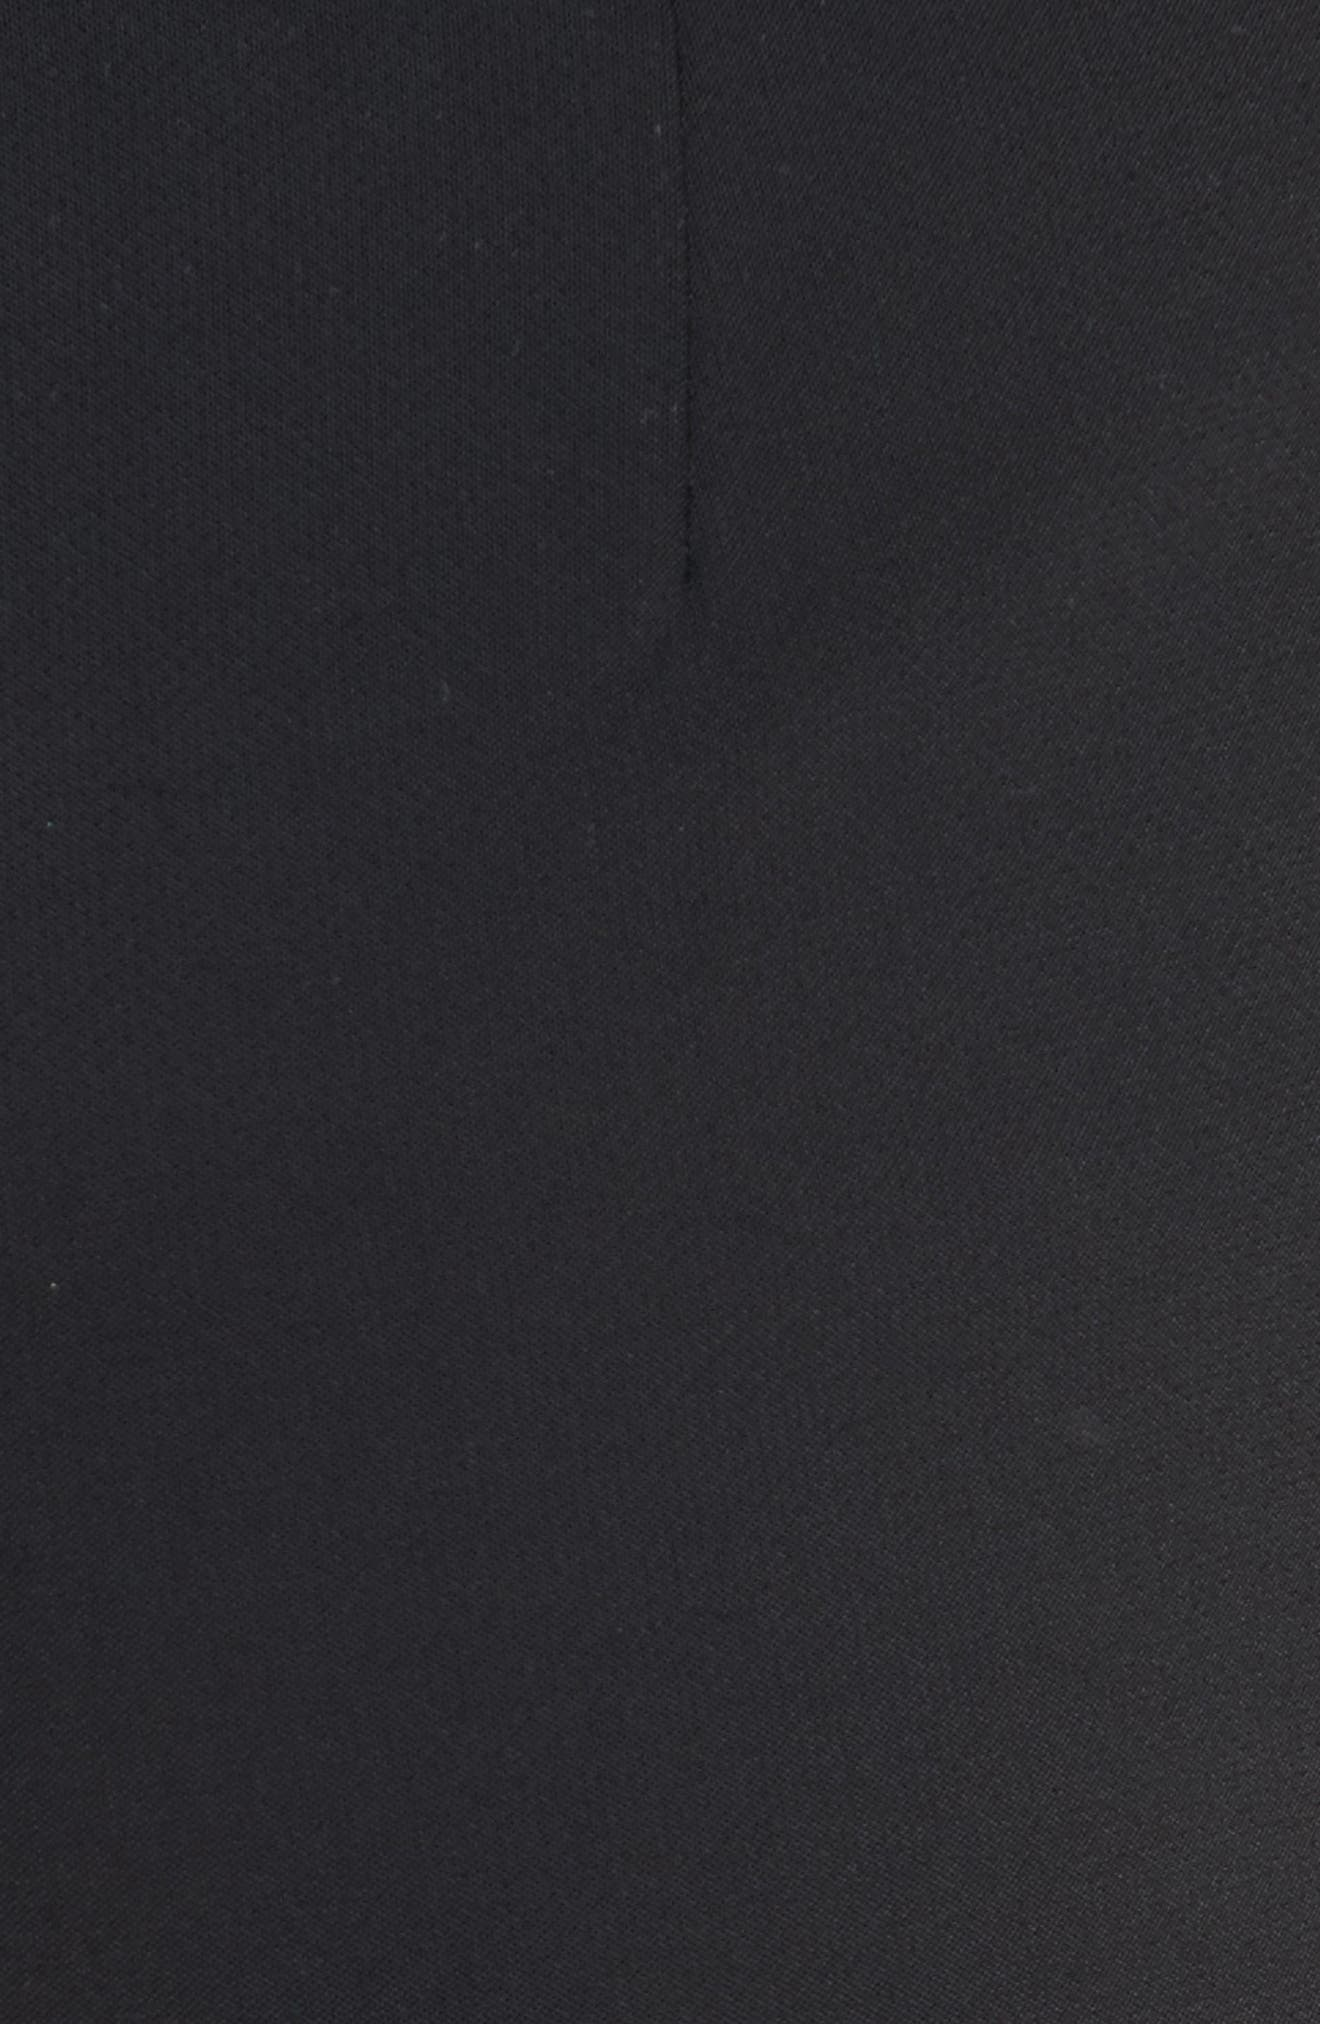 William Ruffle Hem Pants,                             Alternate thumbnail 7, color,                             Black